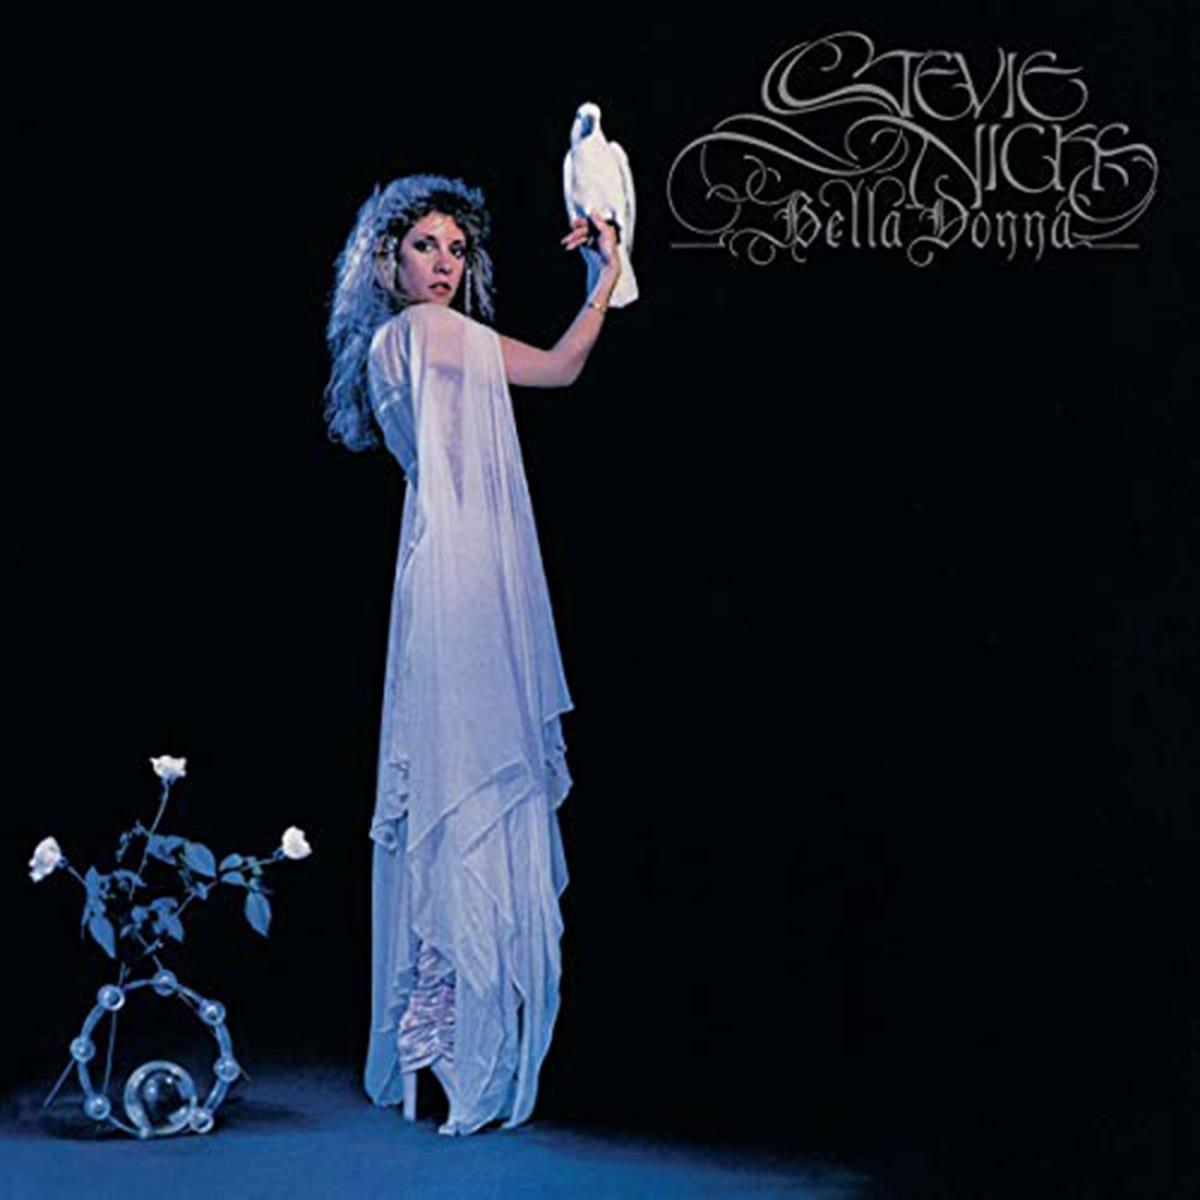 Stevie Nicks Bella Donna album cover